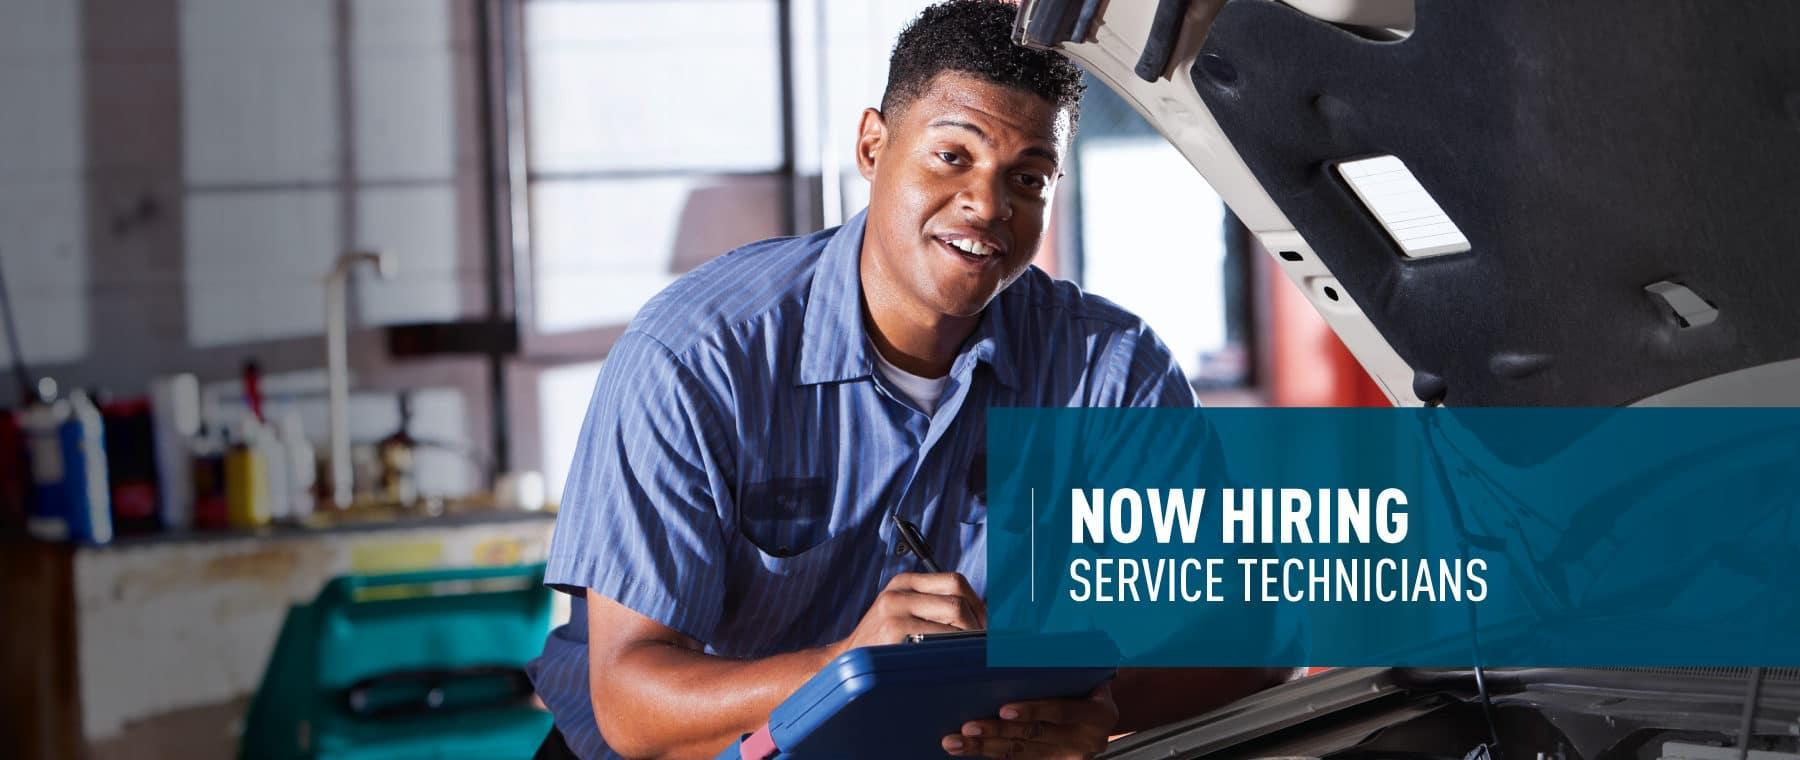 Hiring Service Technicians